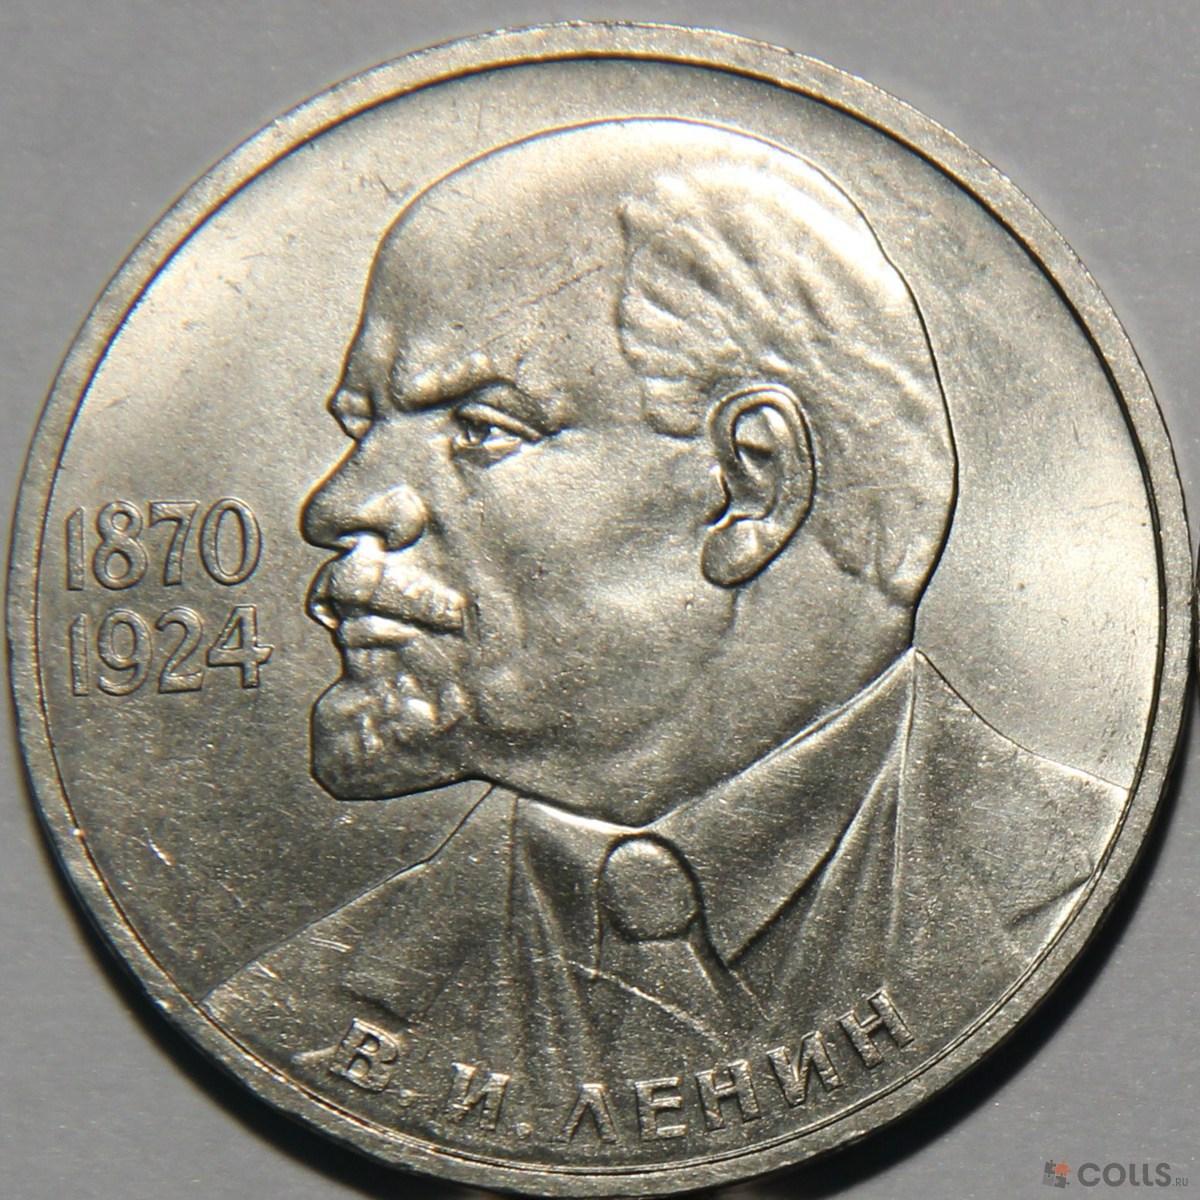 франция 1 франк 1992